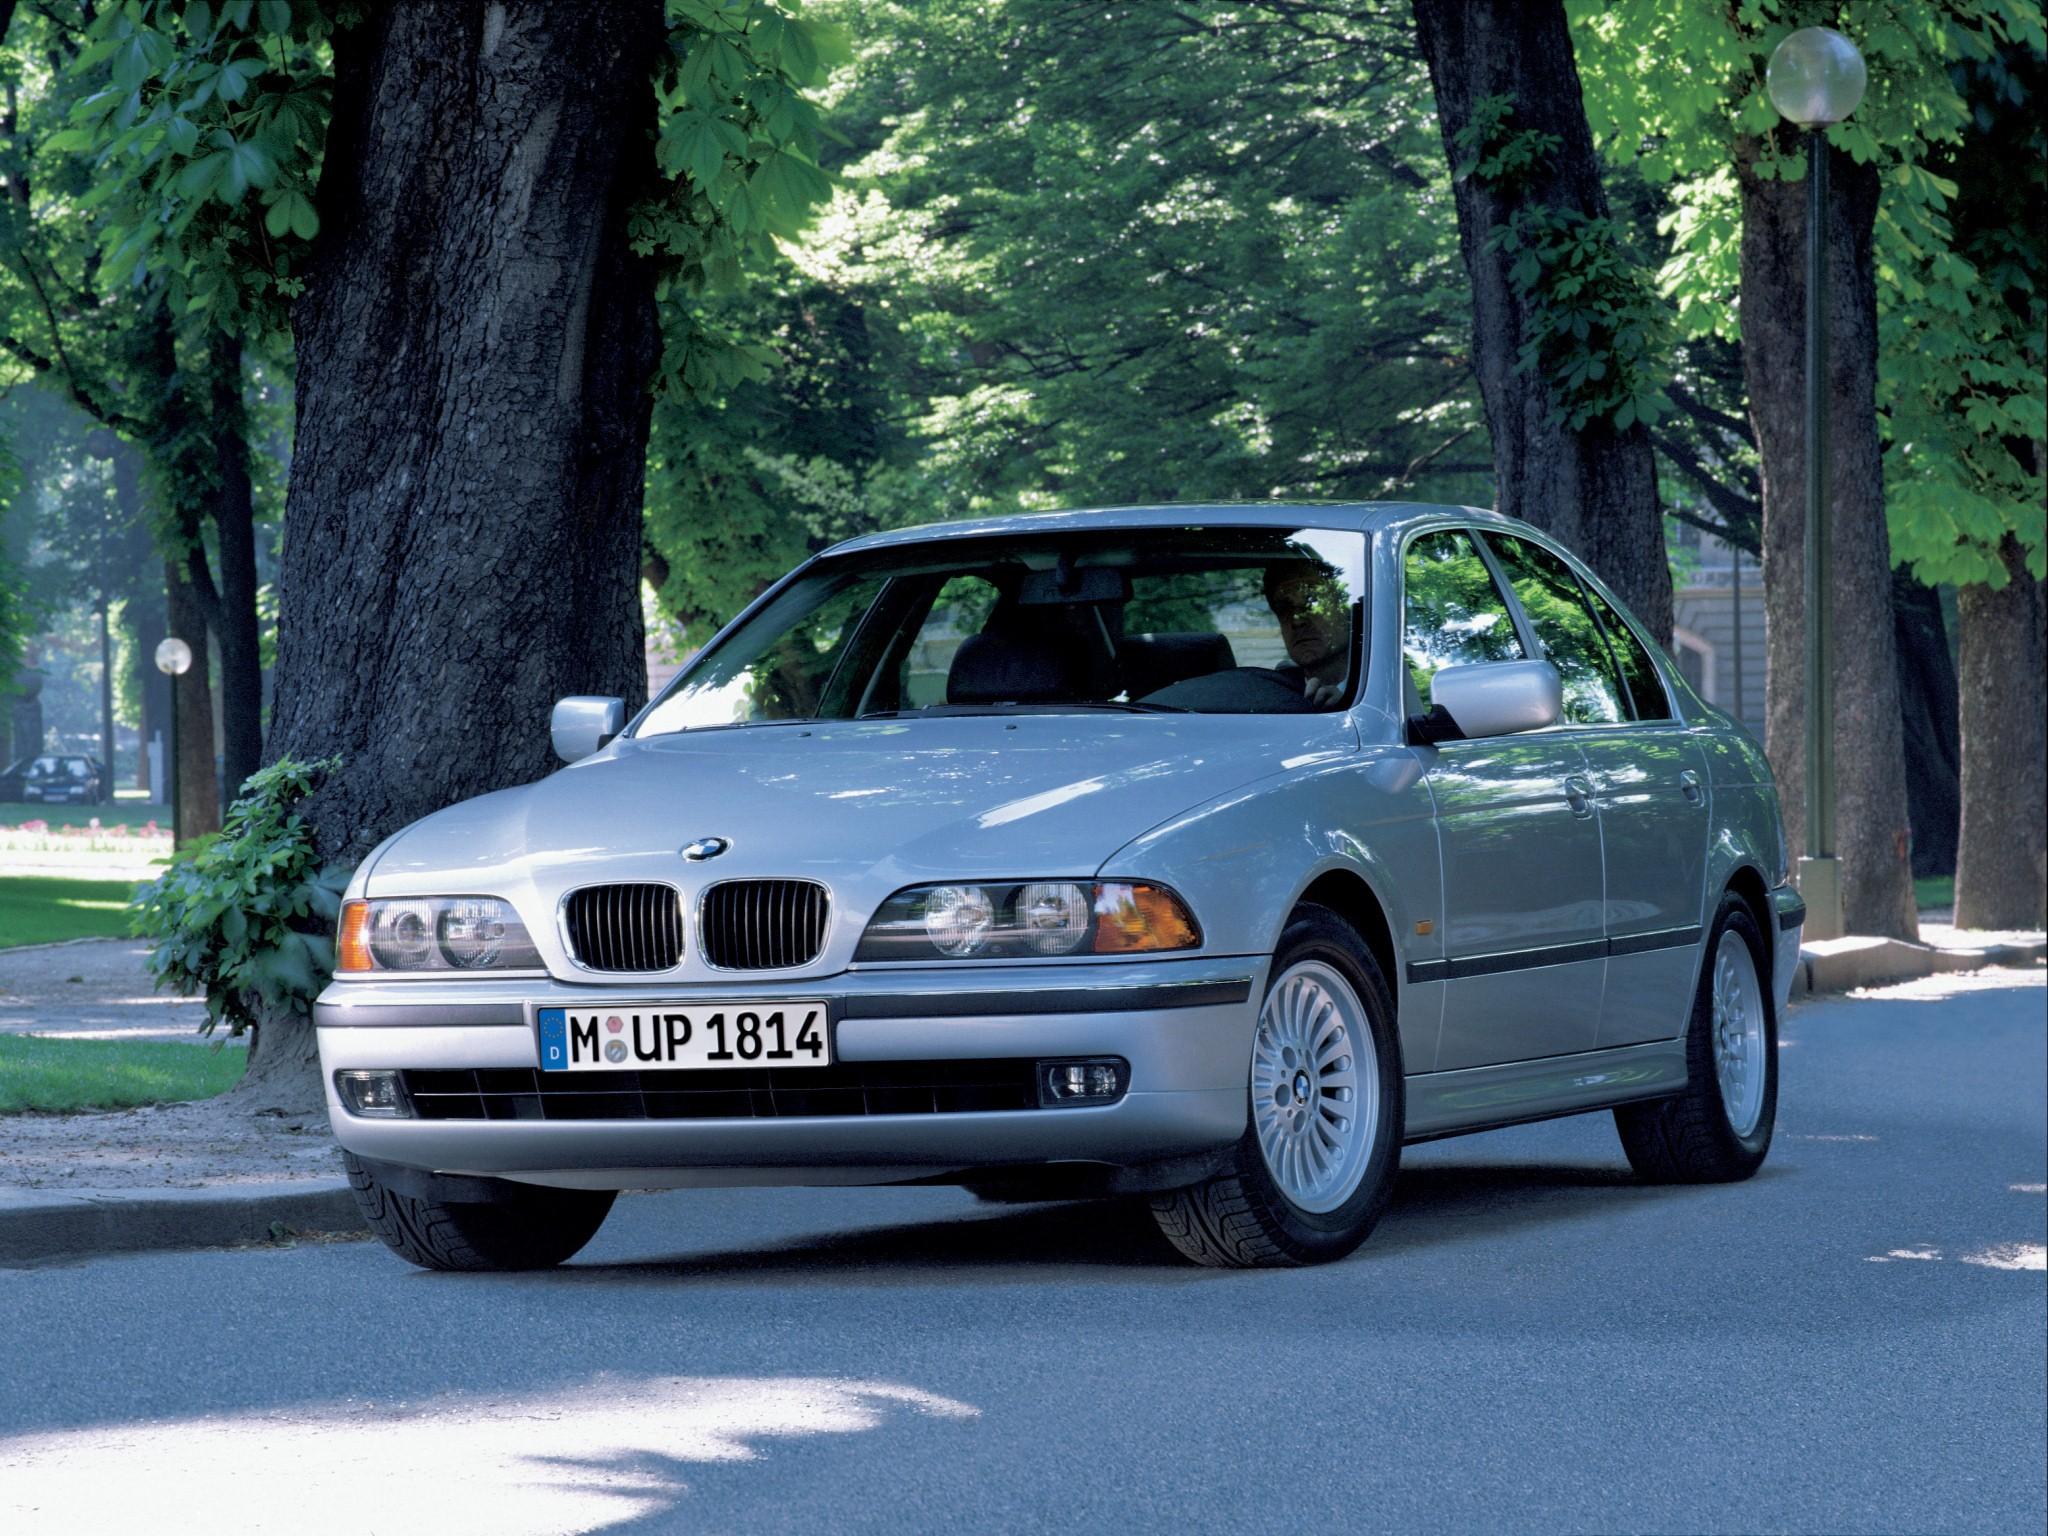 Bmw 5 Series  E39  - 1995  1996  1997  1998  1999  2000